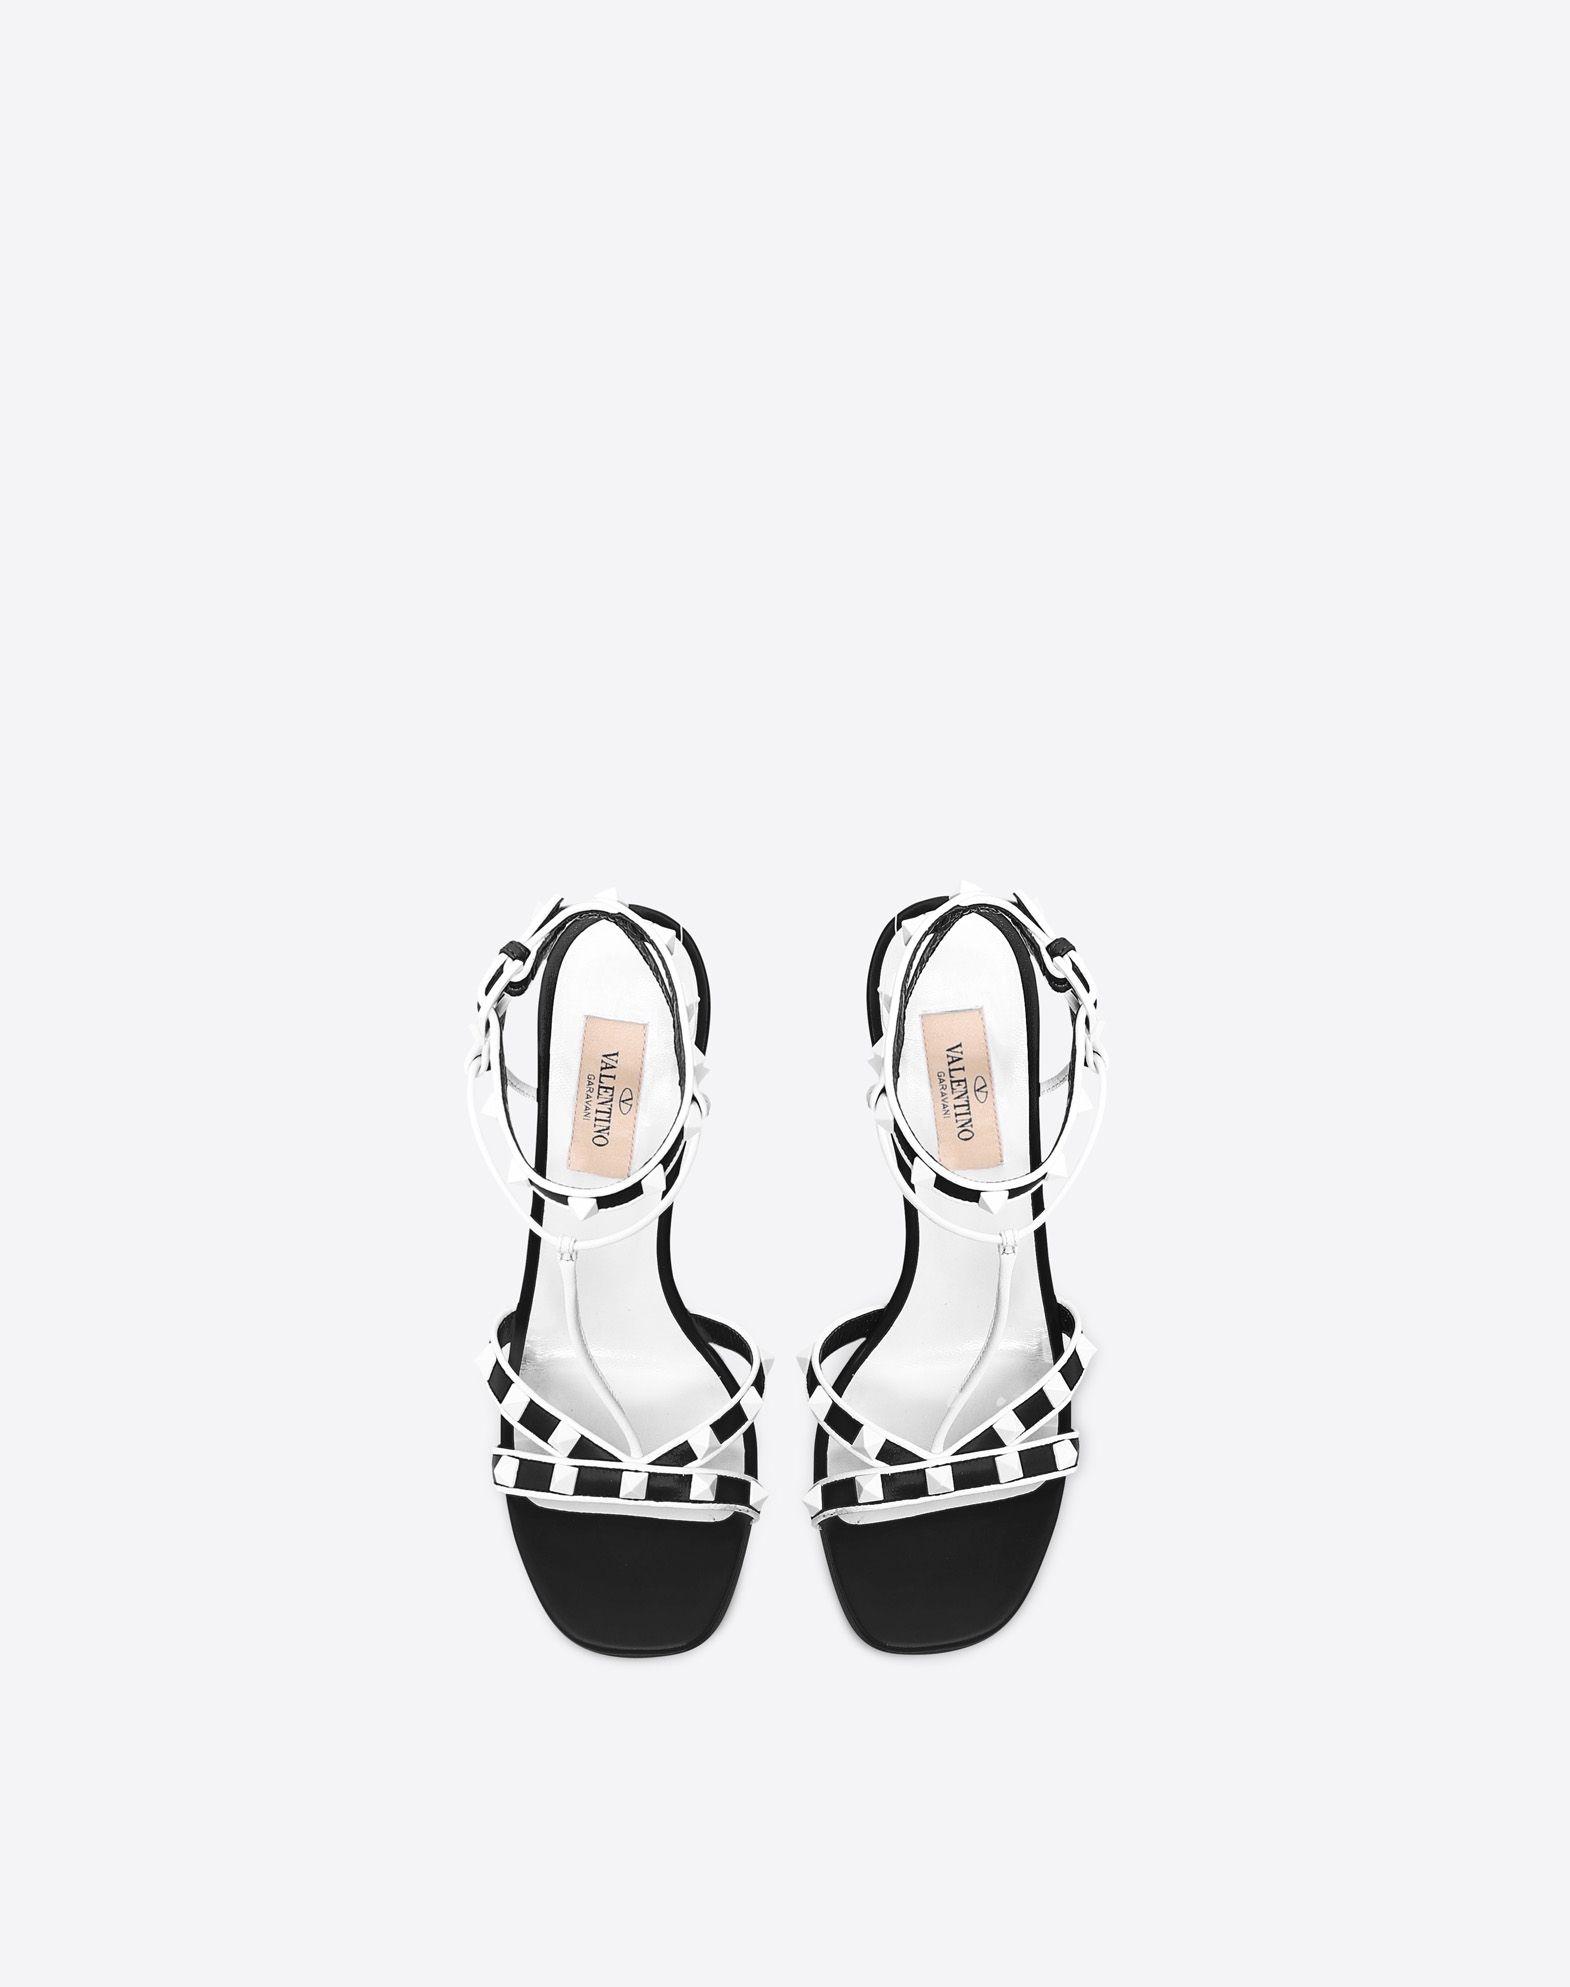 VALENTINO Free Rockstud 105mm Sandal Sandal D e